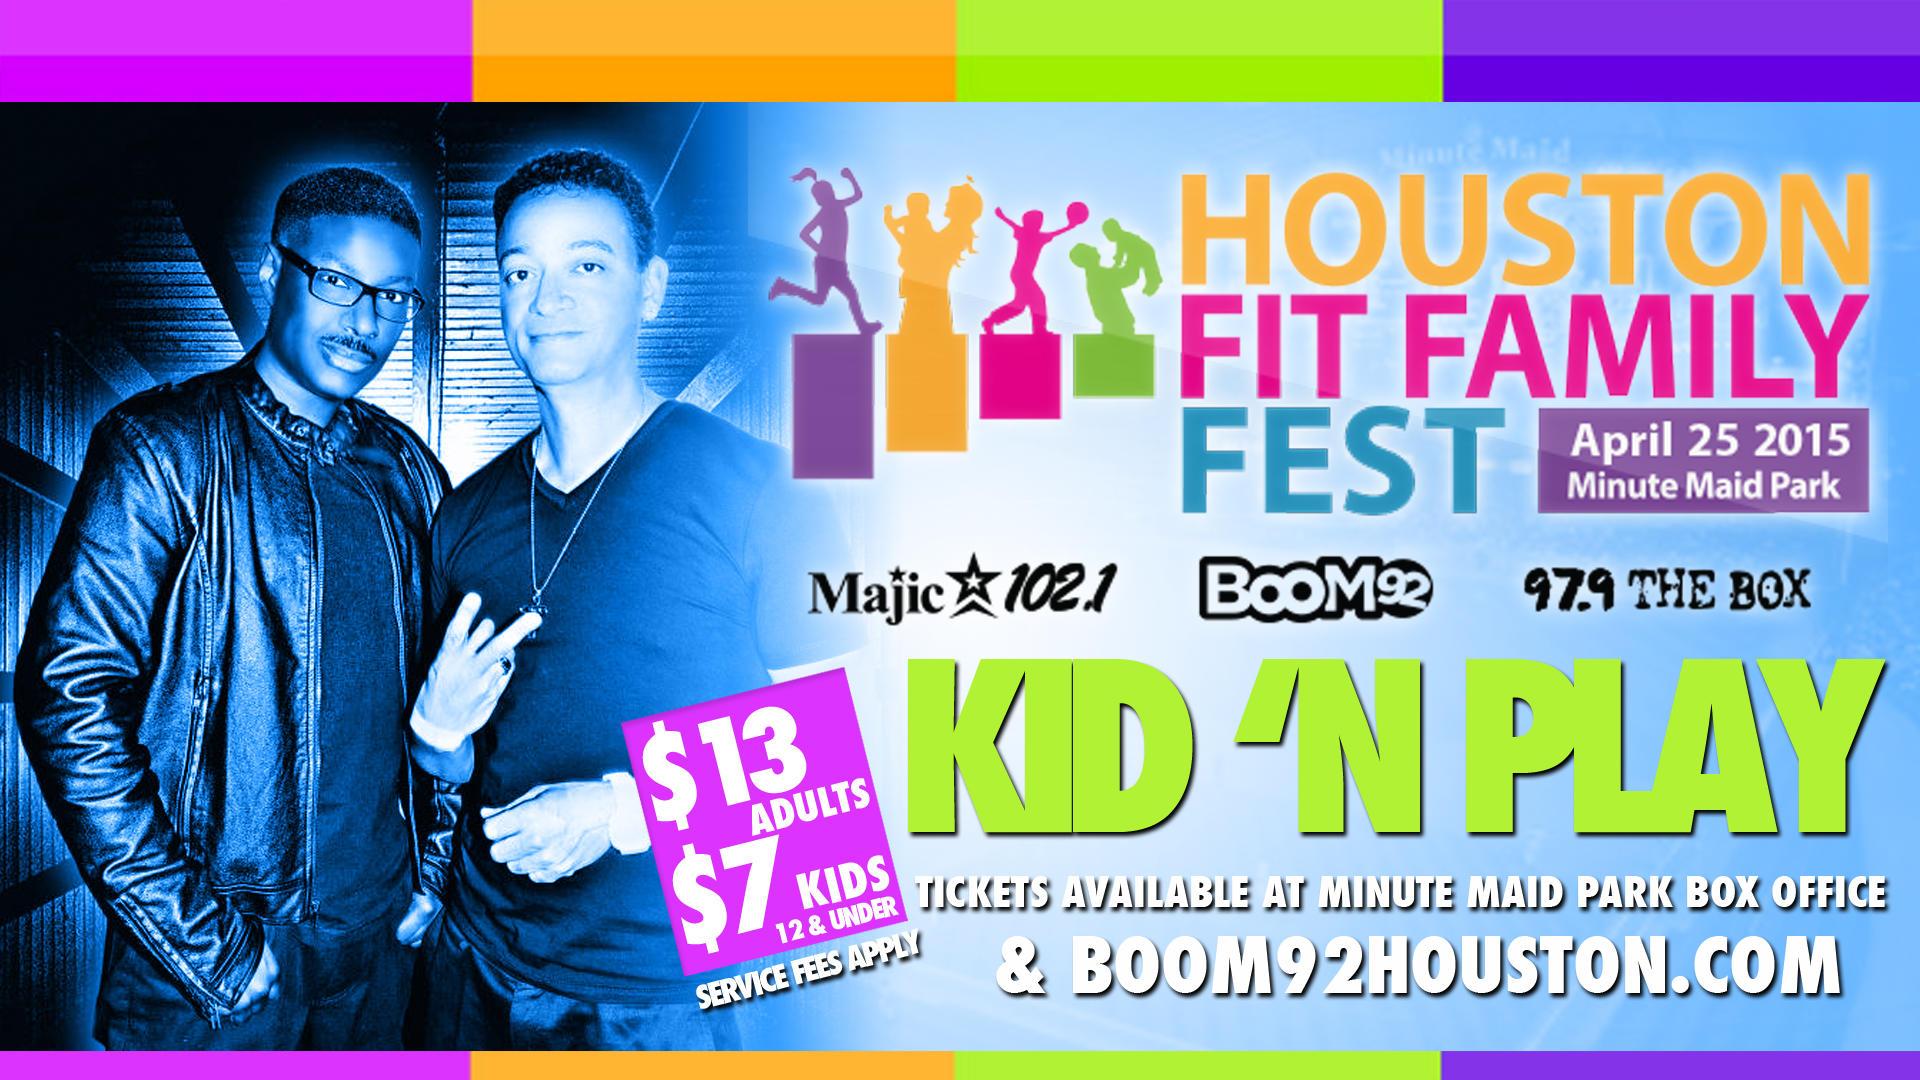 Houston Fit Family Fest Kid & Play